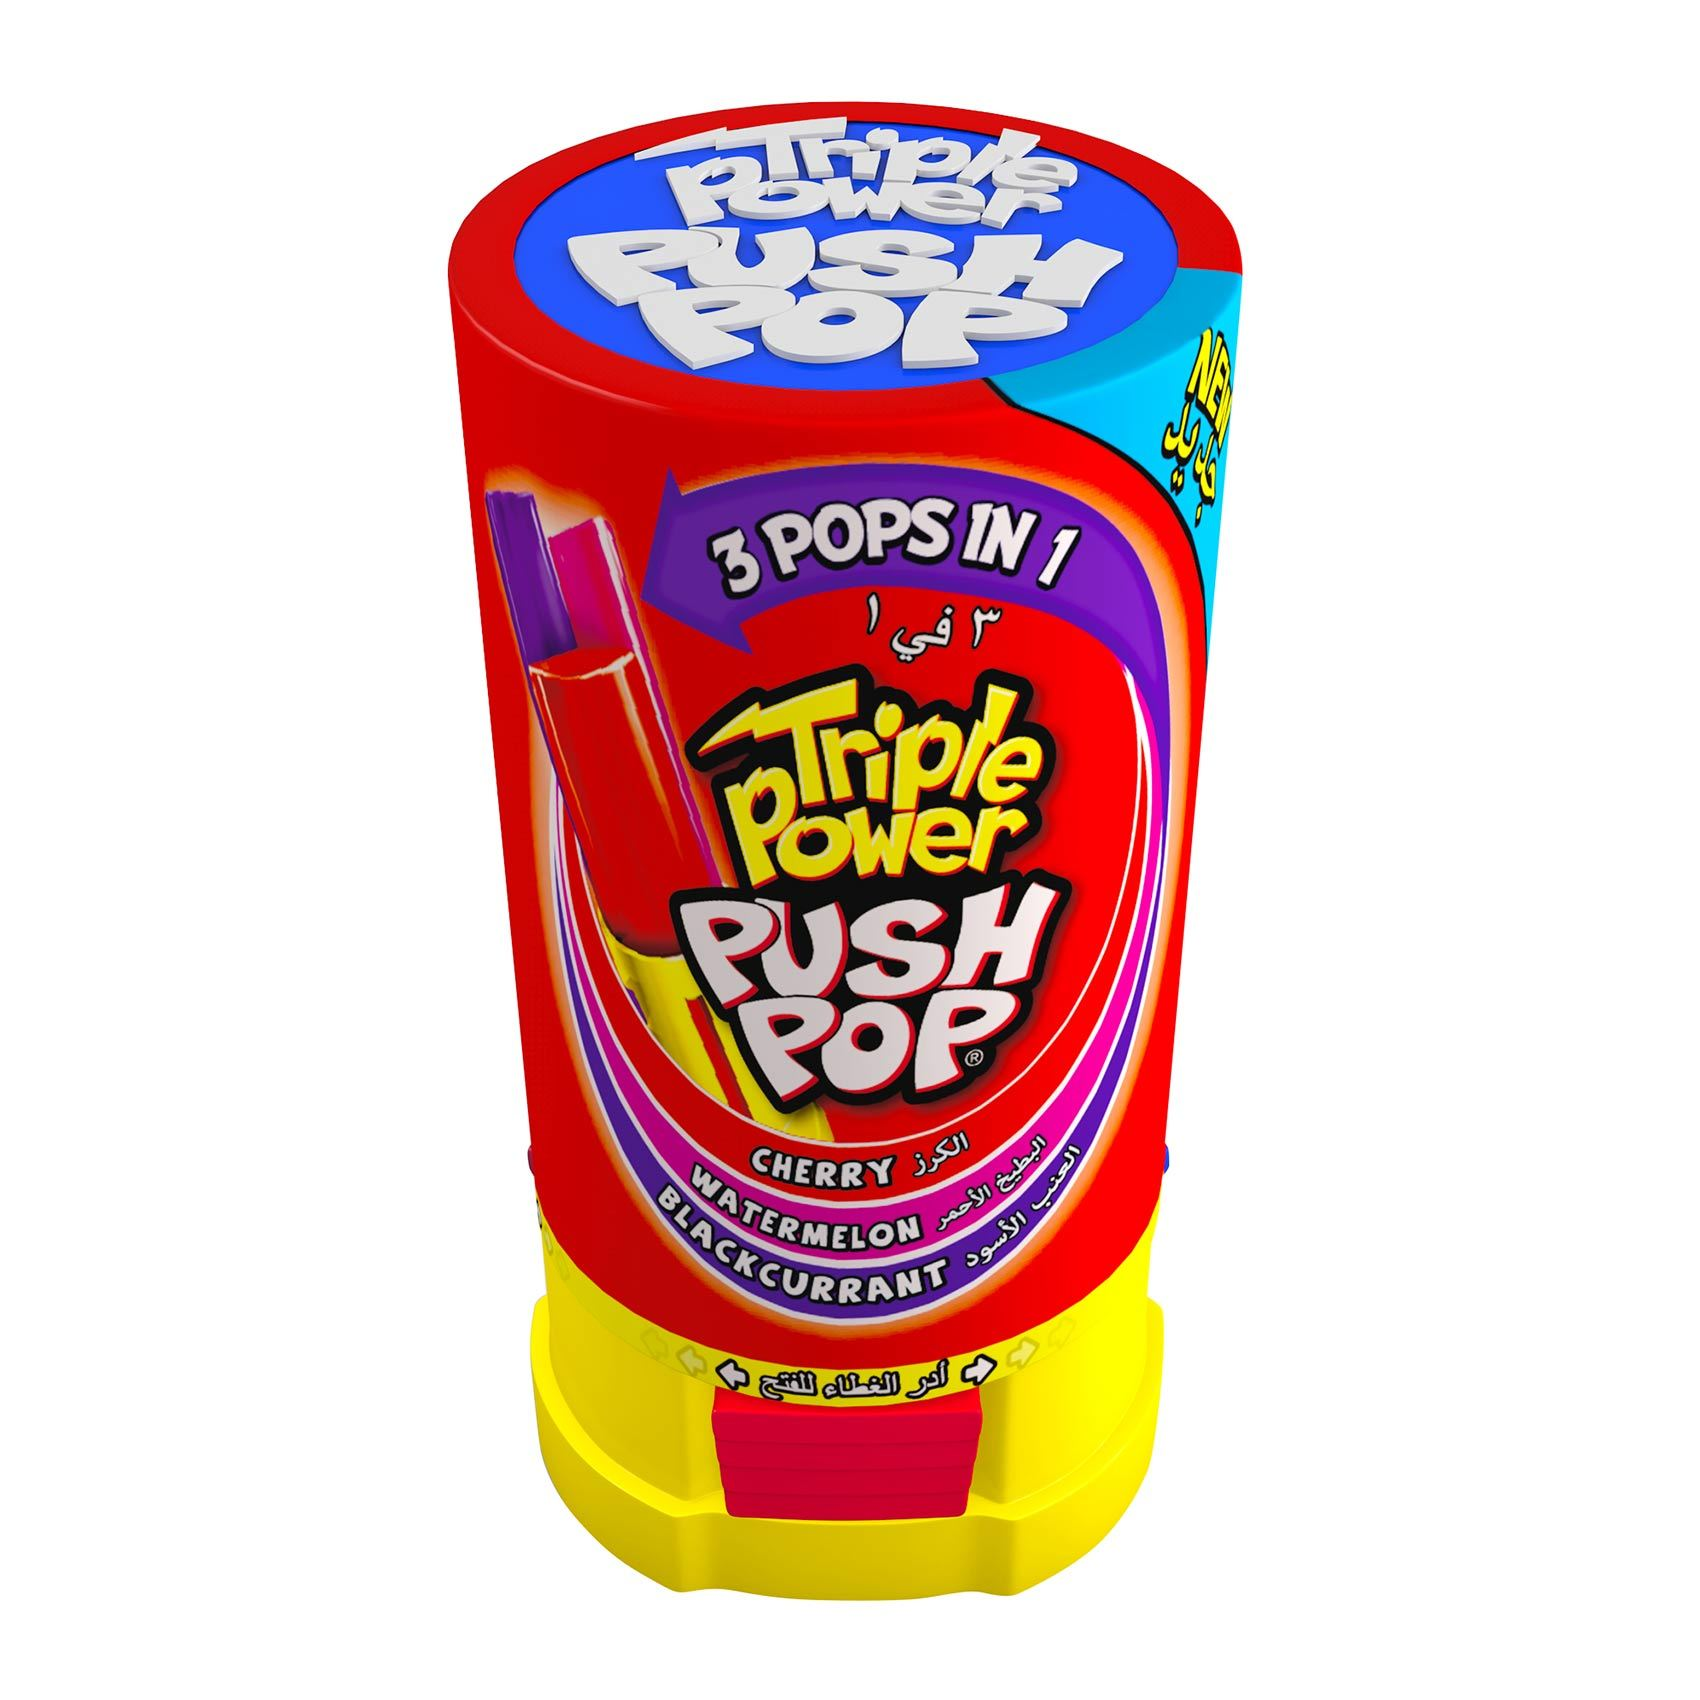 Buy Tripple Powder 3 In 1 Push Pop 34 G Online Shop Food Cupboard On Carrefour Saudi Arabia